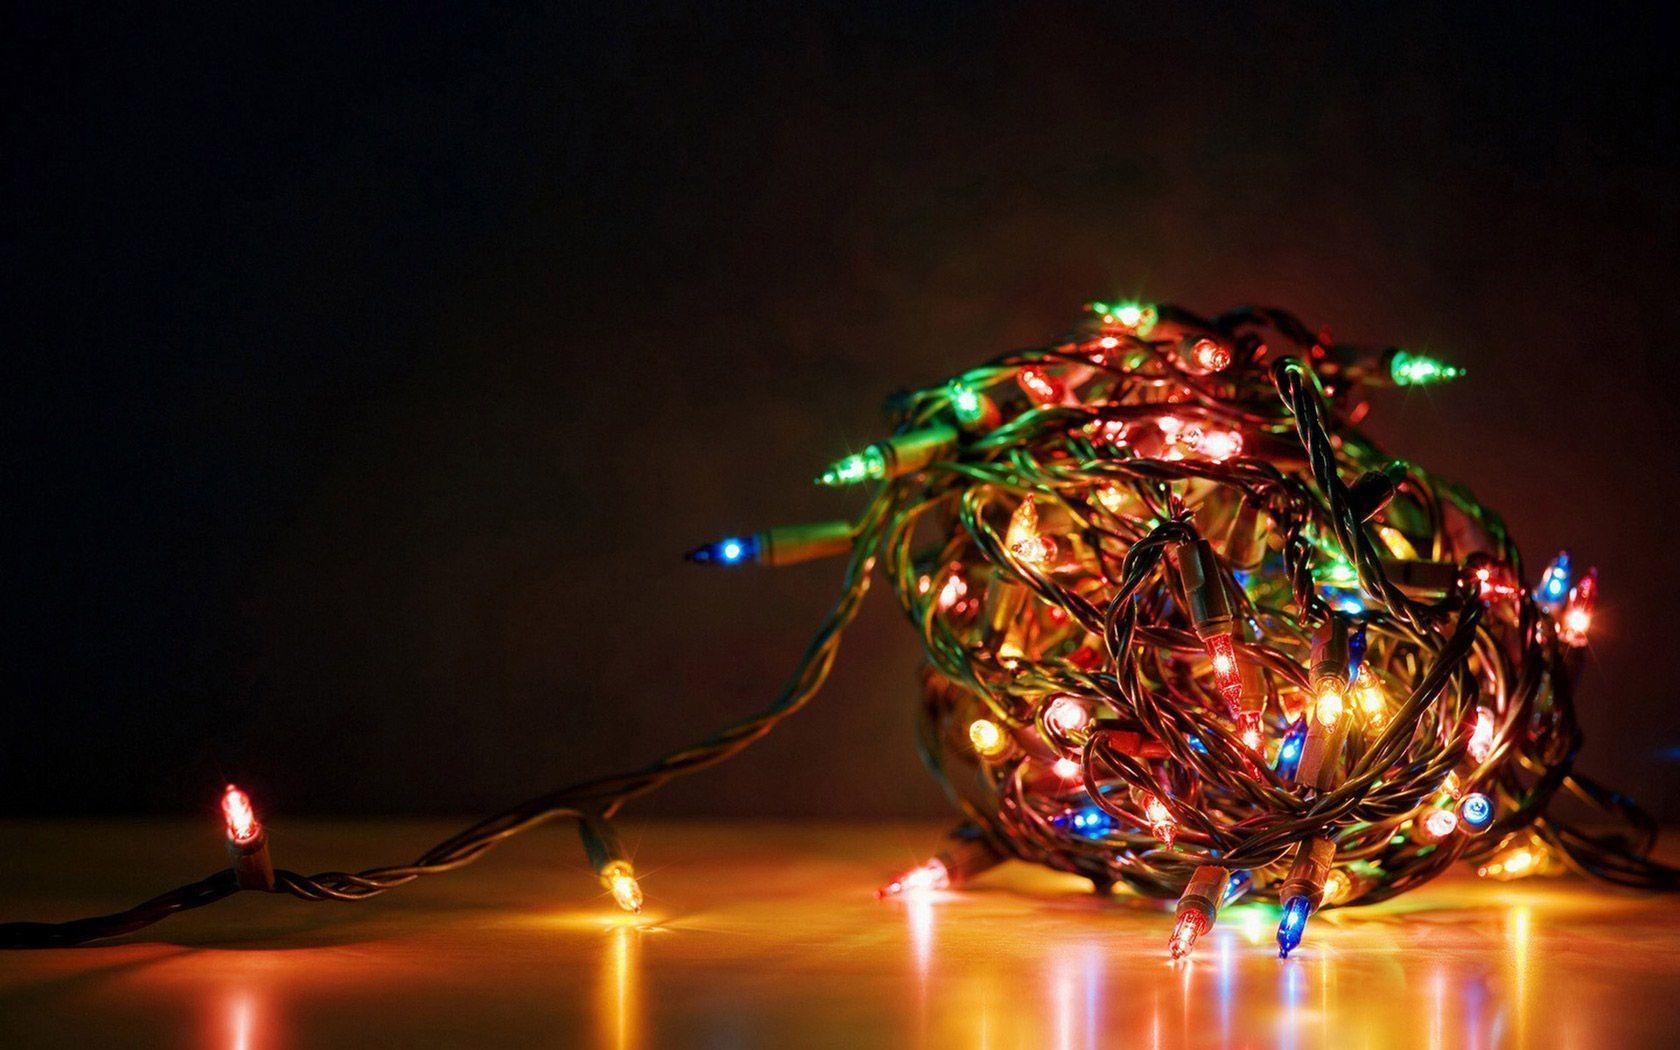 Christmas Desktop Pictures.Christmas Lights Desktop Wallpapers Top Free Christmas